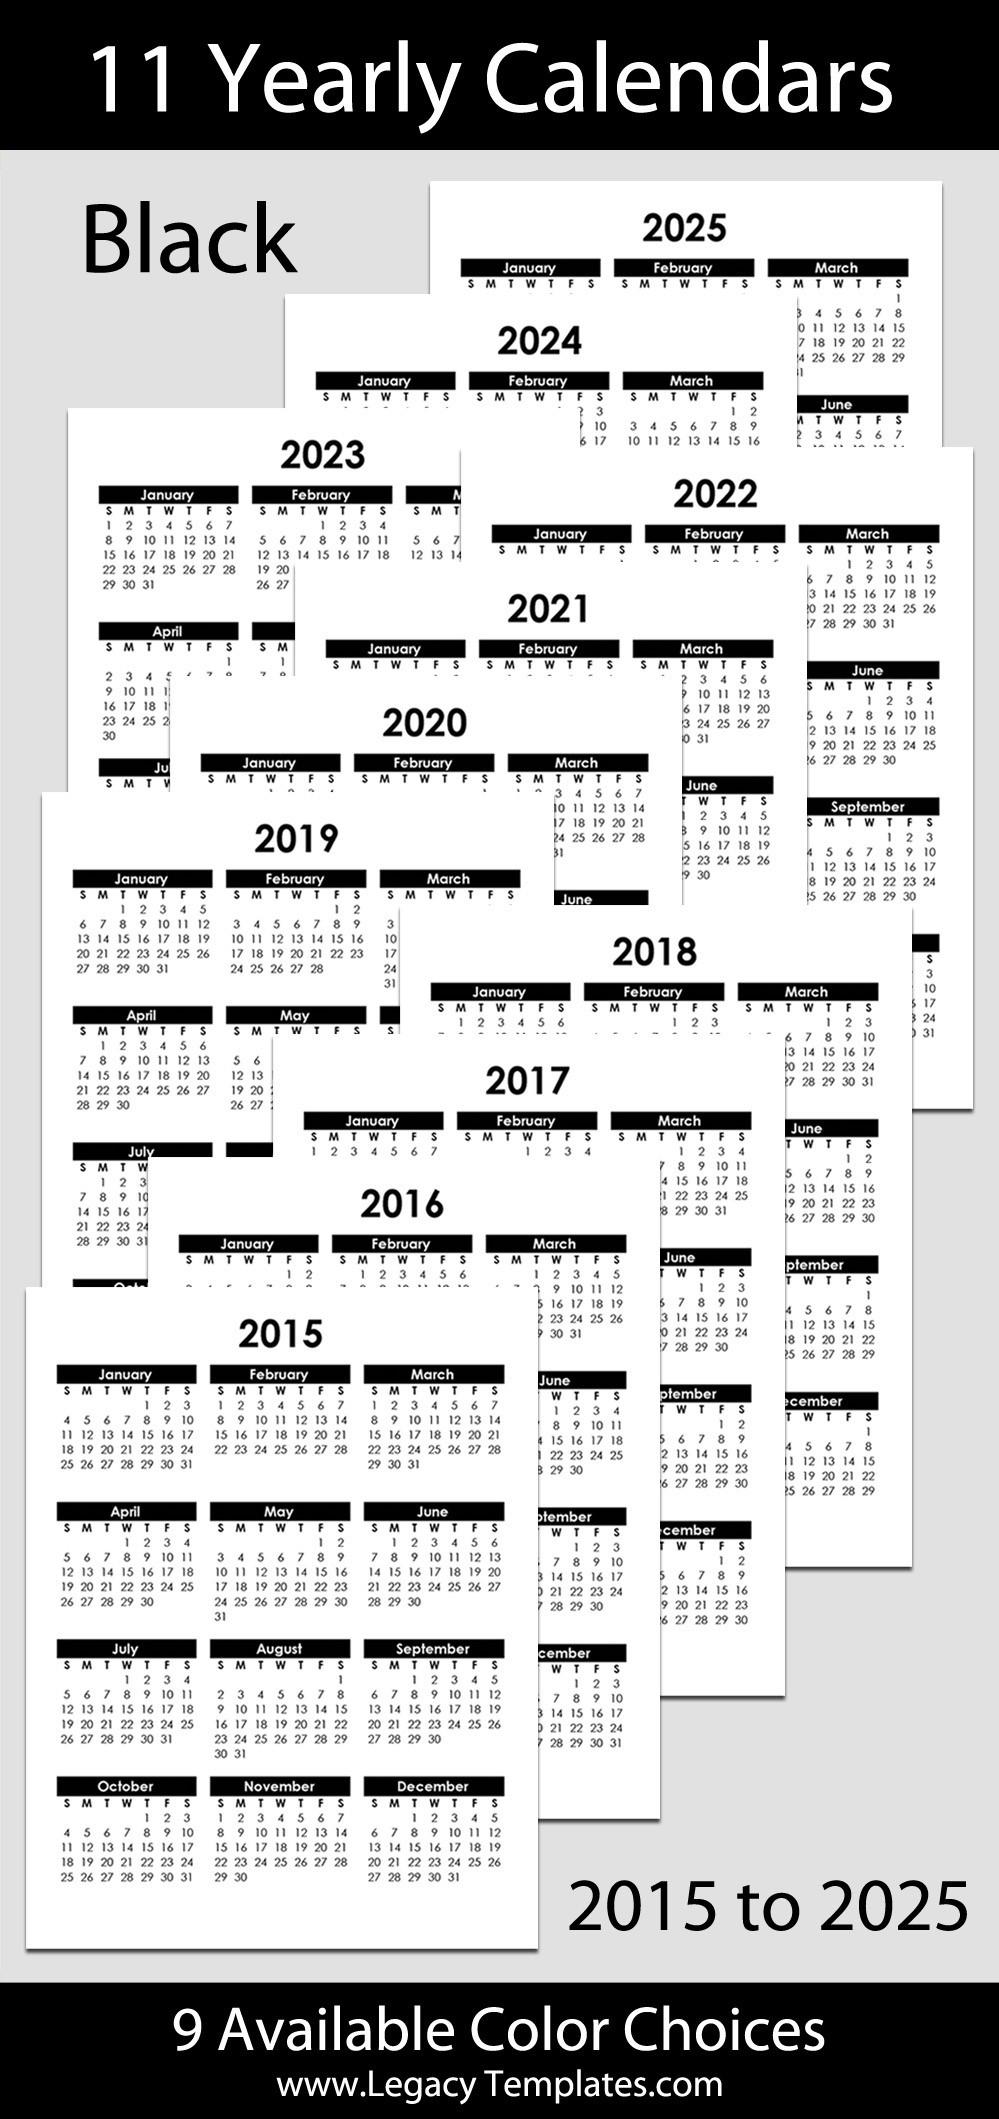 "2015 To 2025 Yearly Calendar - 8 1/2"" X 11"" | Legacy Templates-8.5 X 11 Calendar Print"